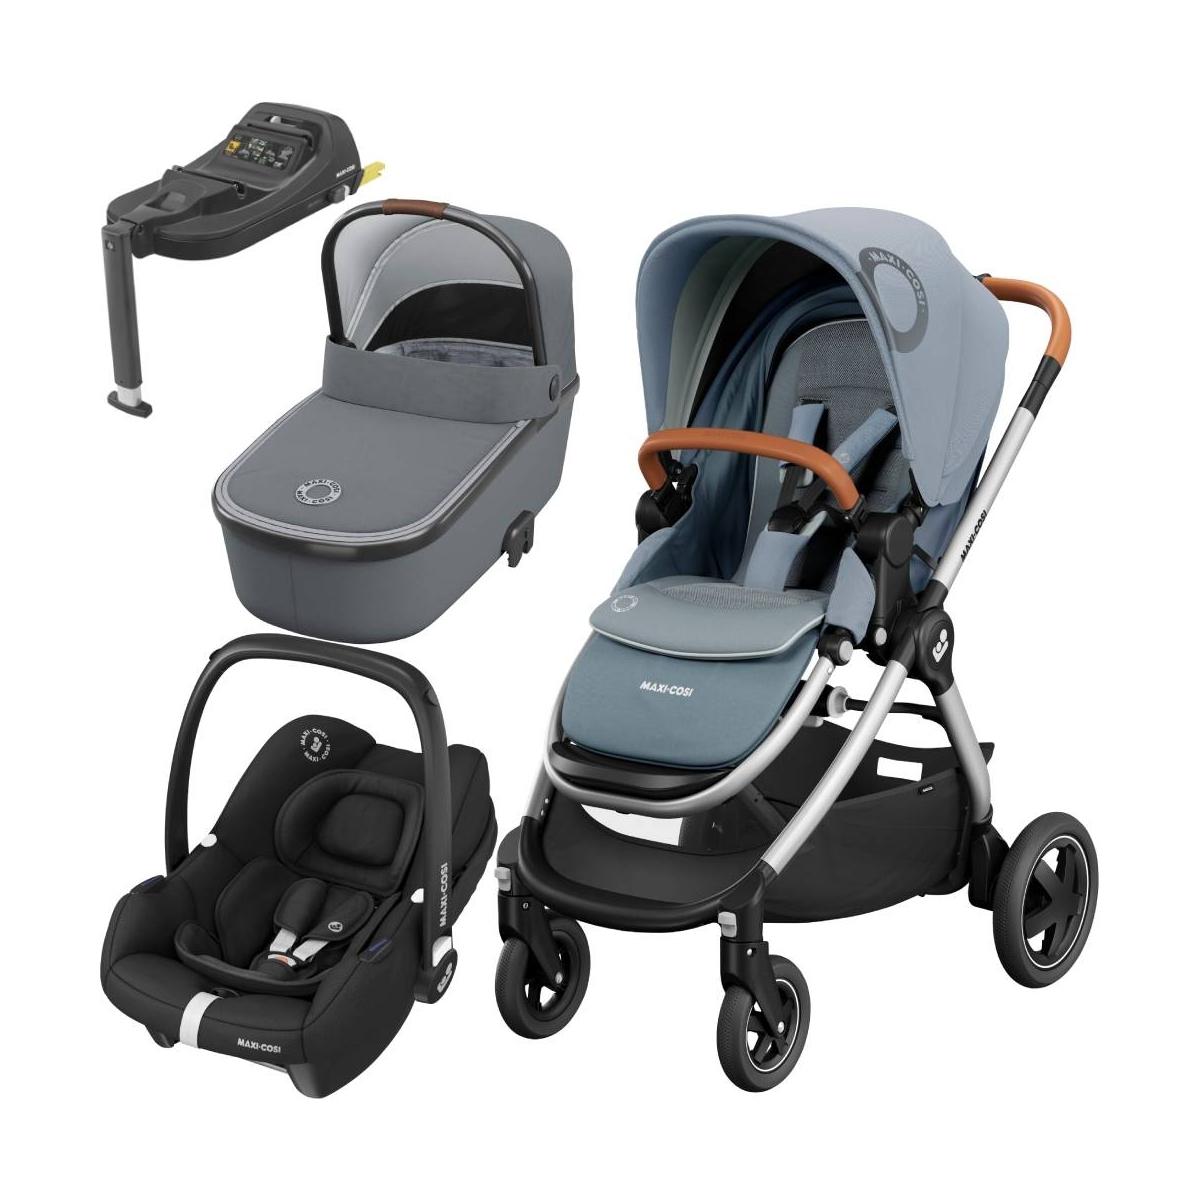 Maxi Cosi Adorra 2 With Carrycot, Tinca Car Seat & Base-Essential Grey